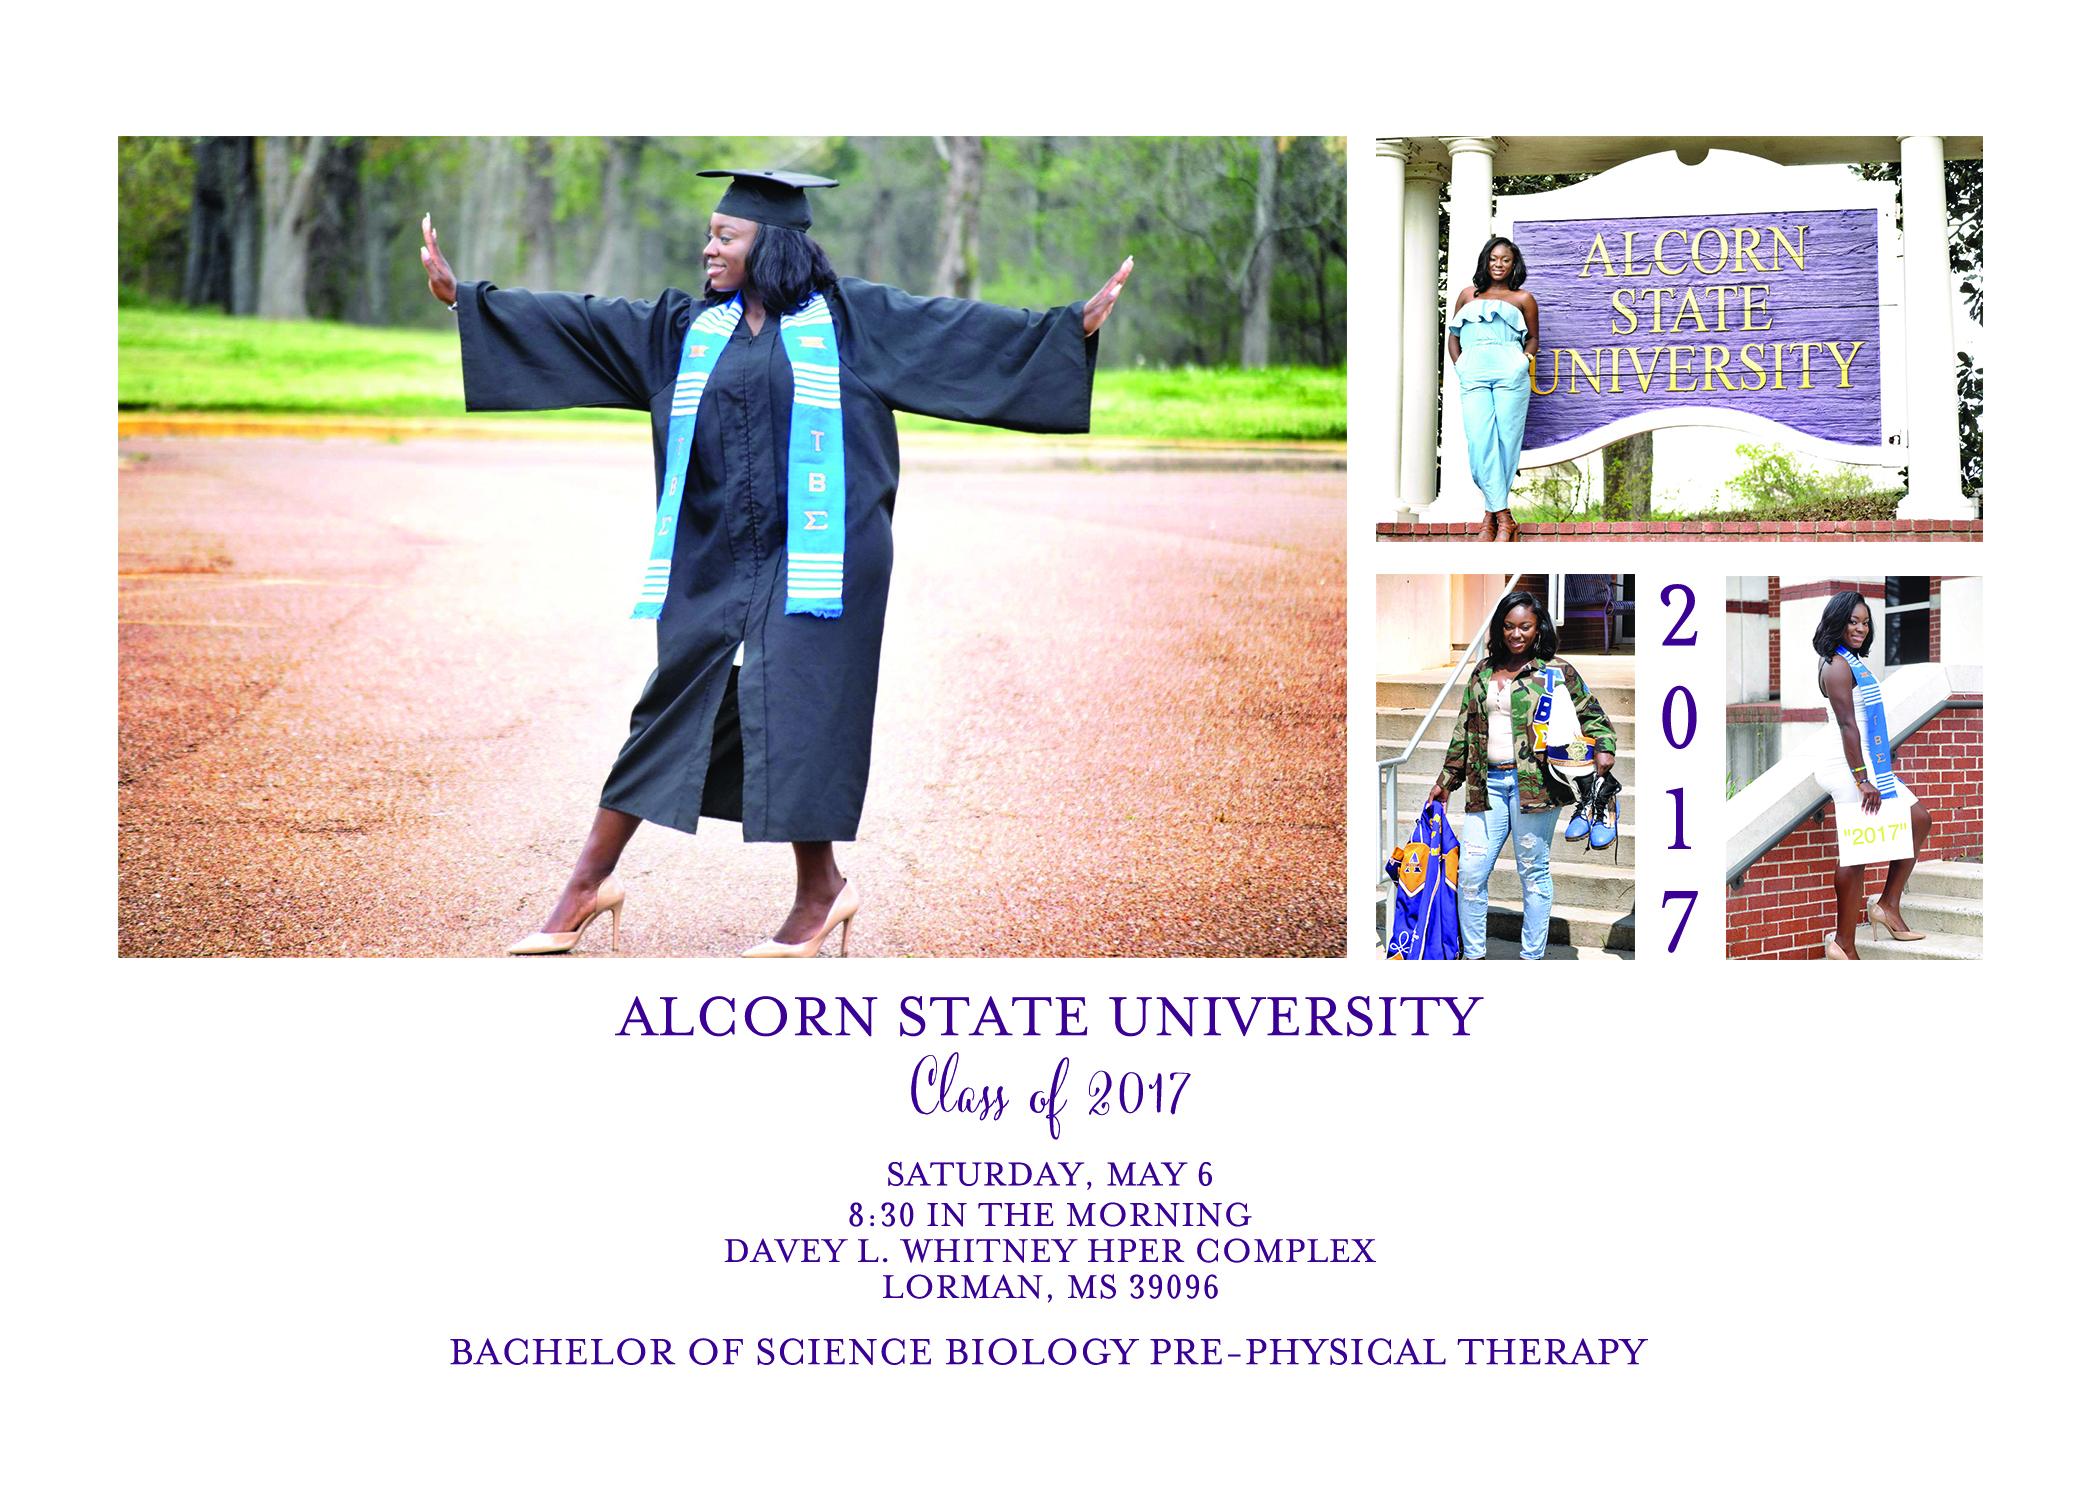 graduation announcement side 2.jpg